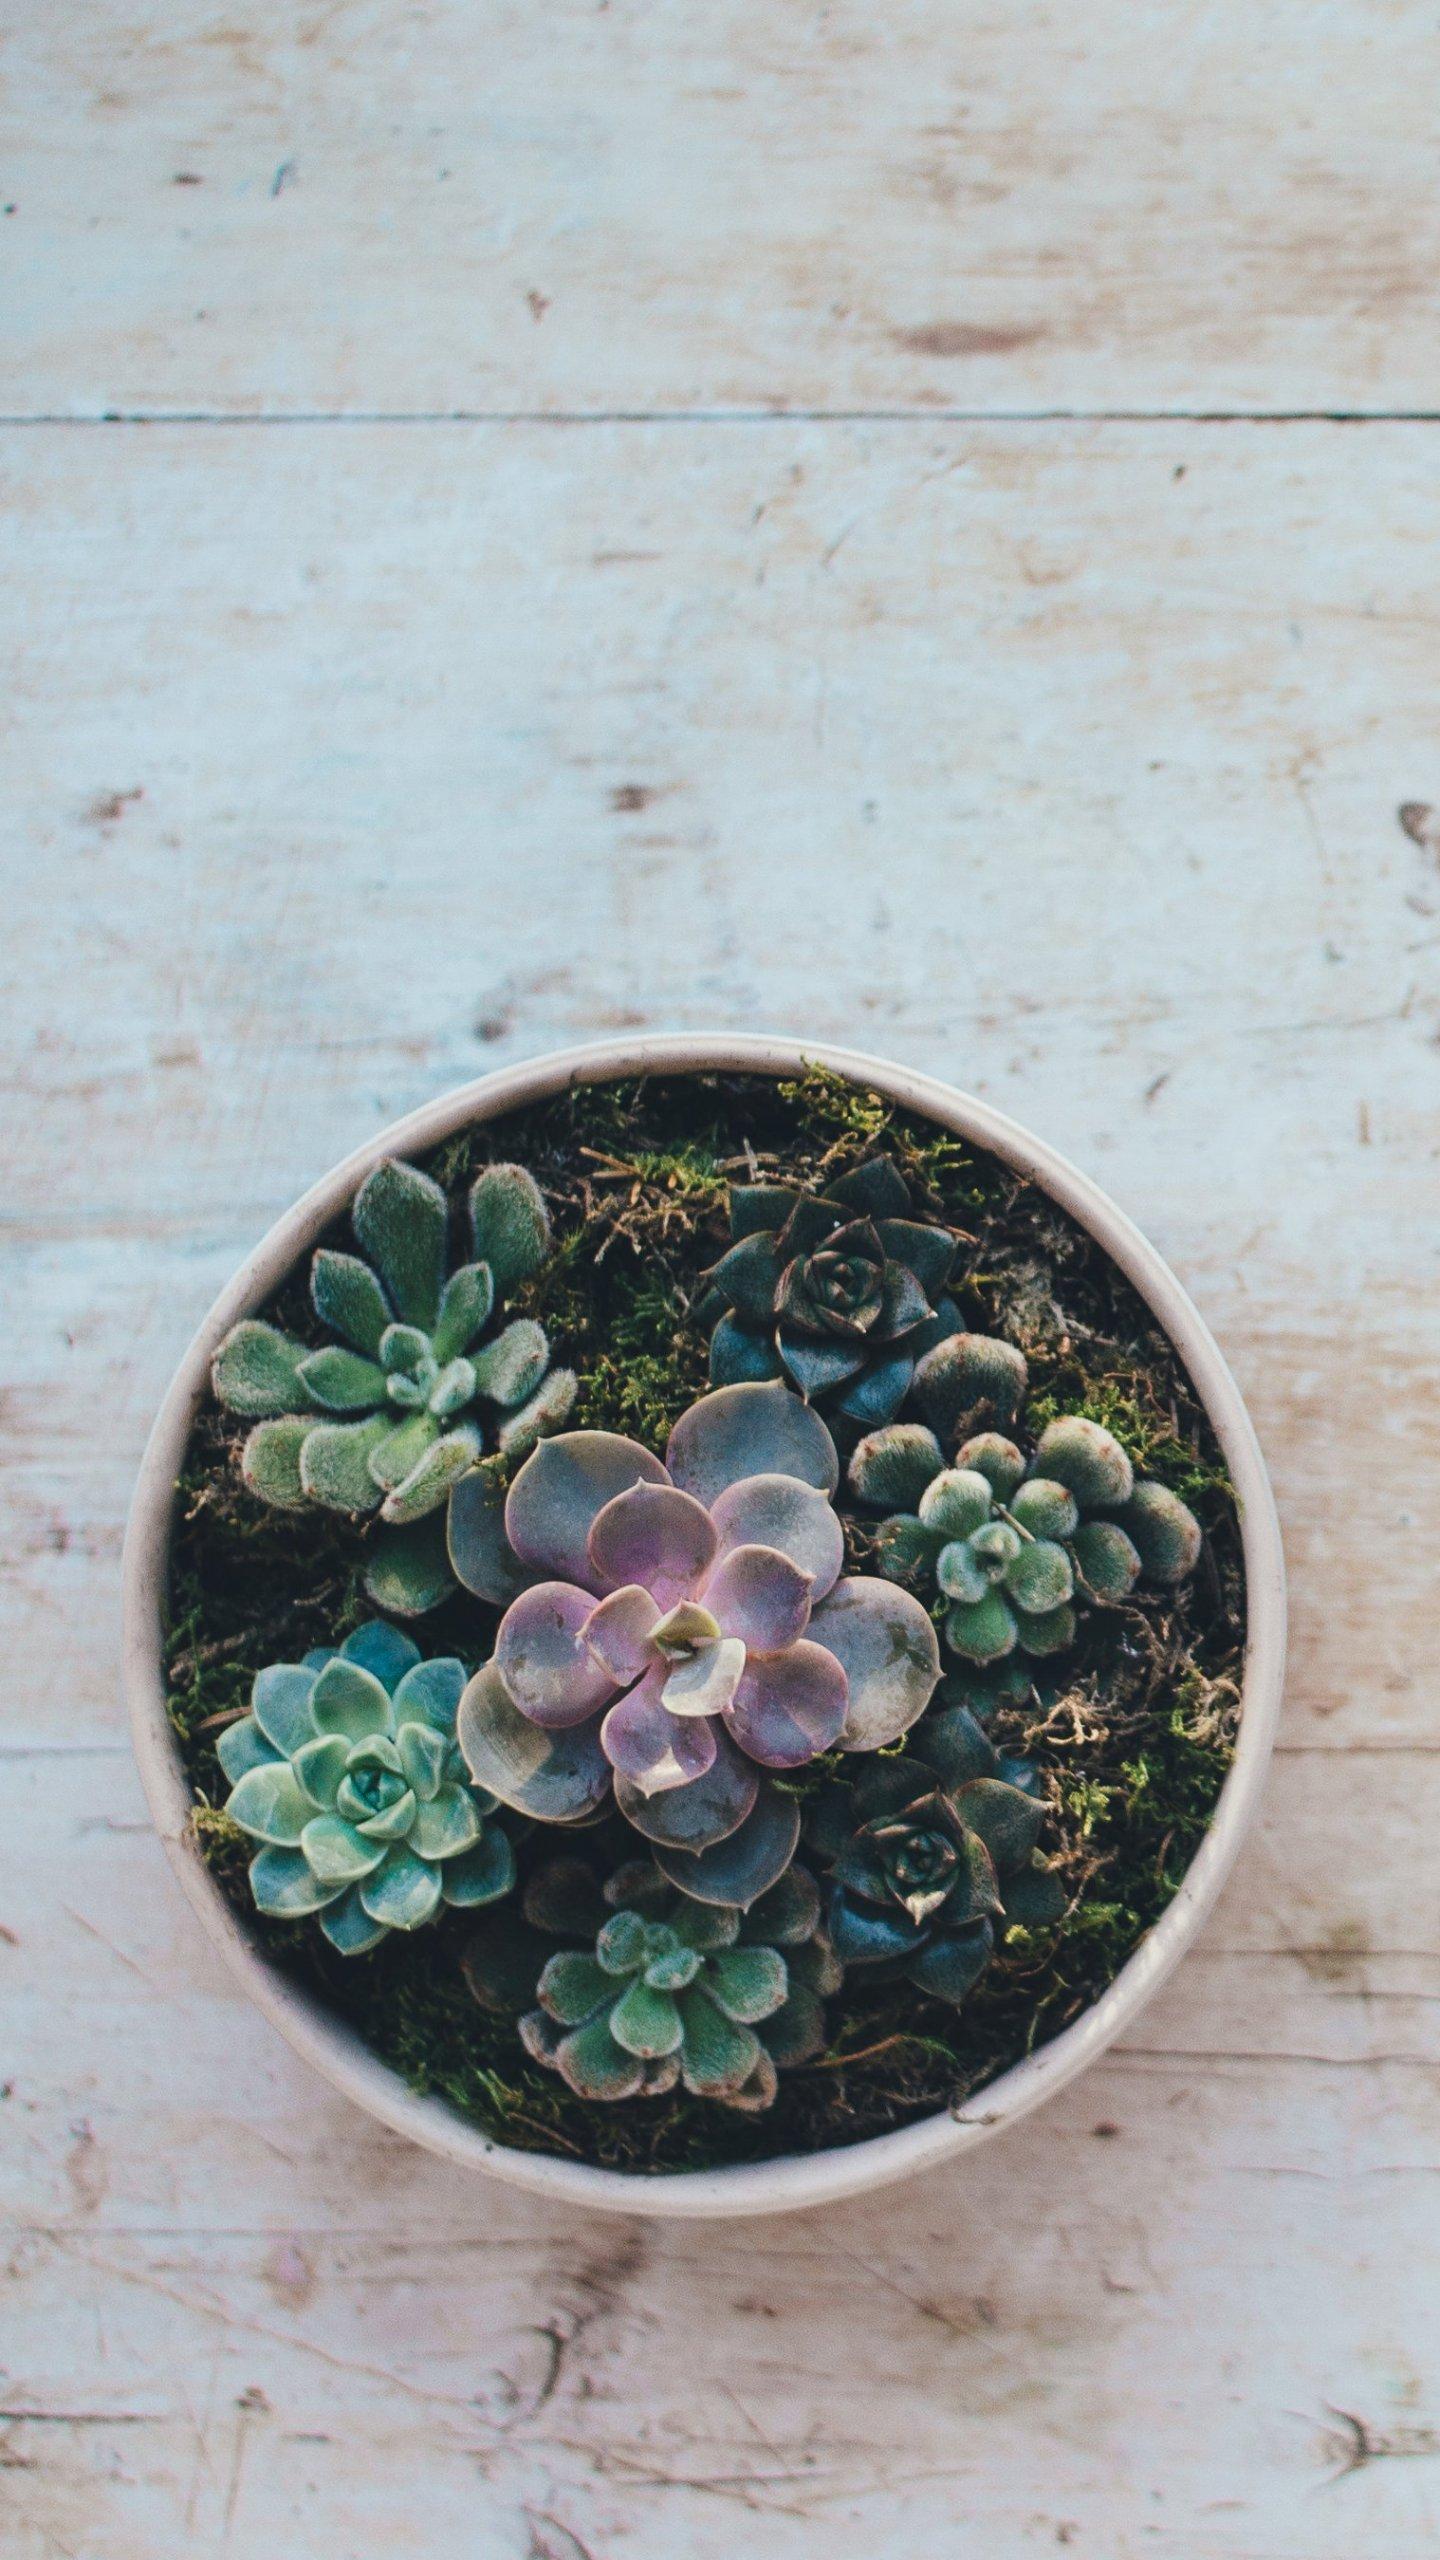 Cactus Succulent Wallpaper Iphone Android Desktop Backgrounds